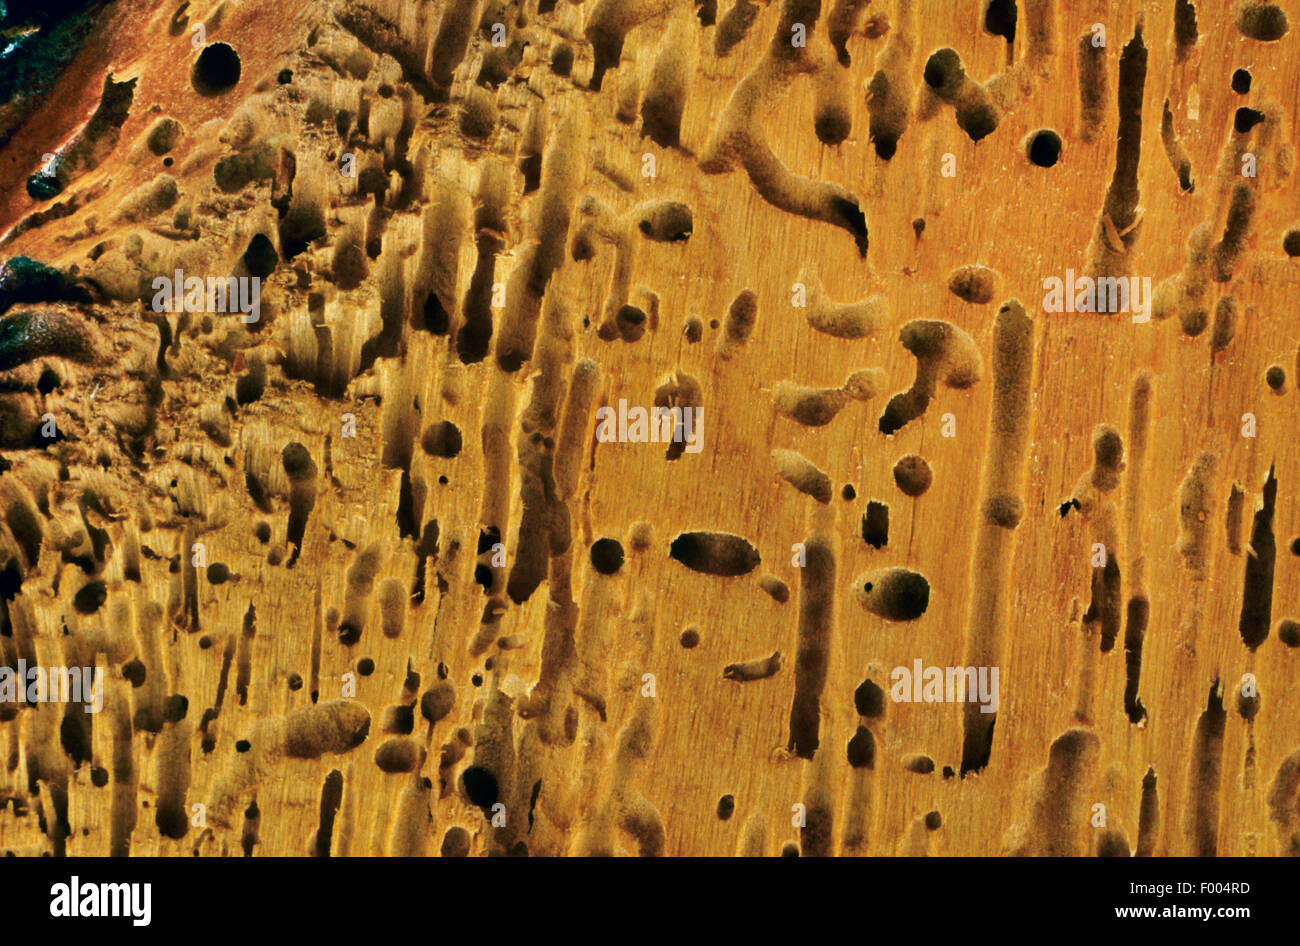 Möbel-Käfer, Holzwurm (Anobium spec.), Schäden Stockbild